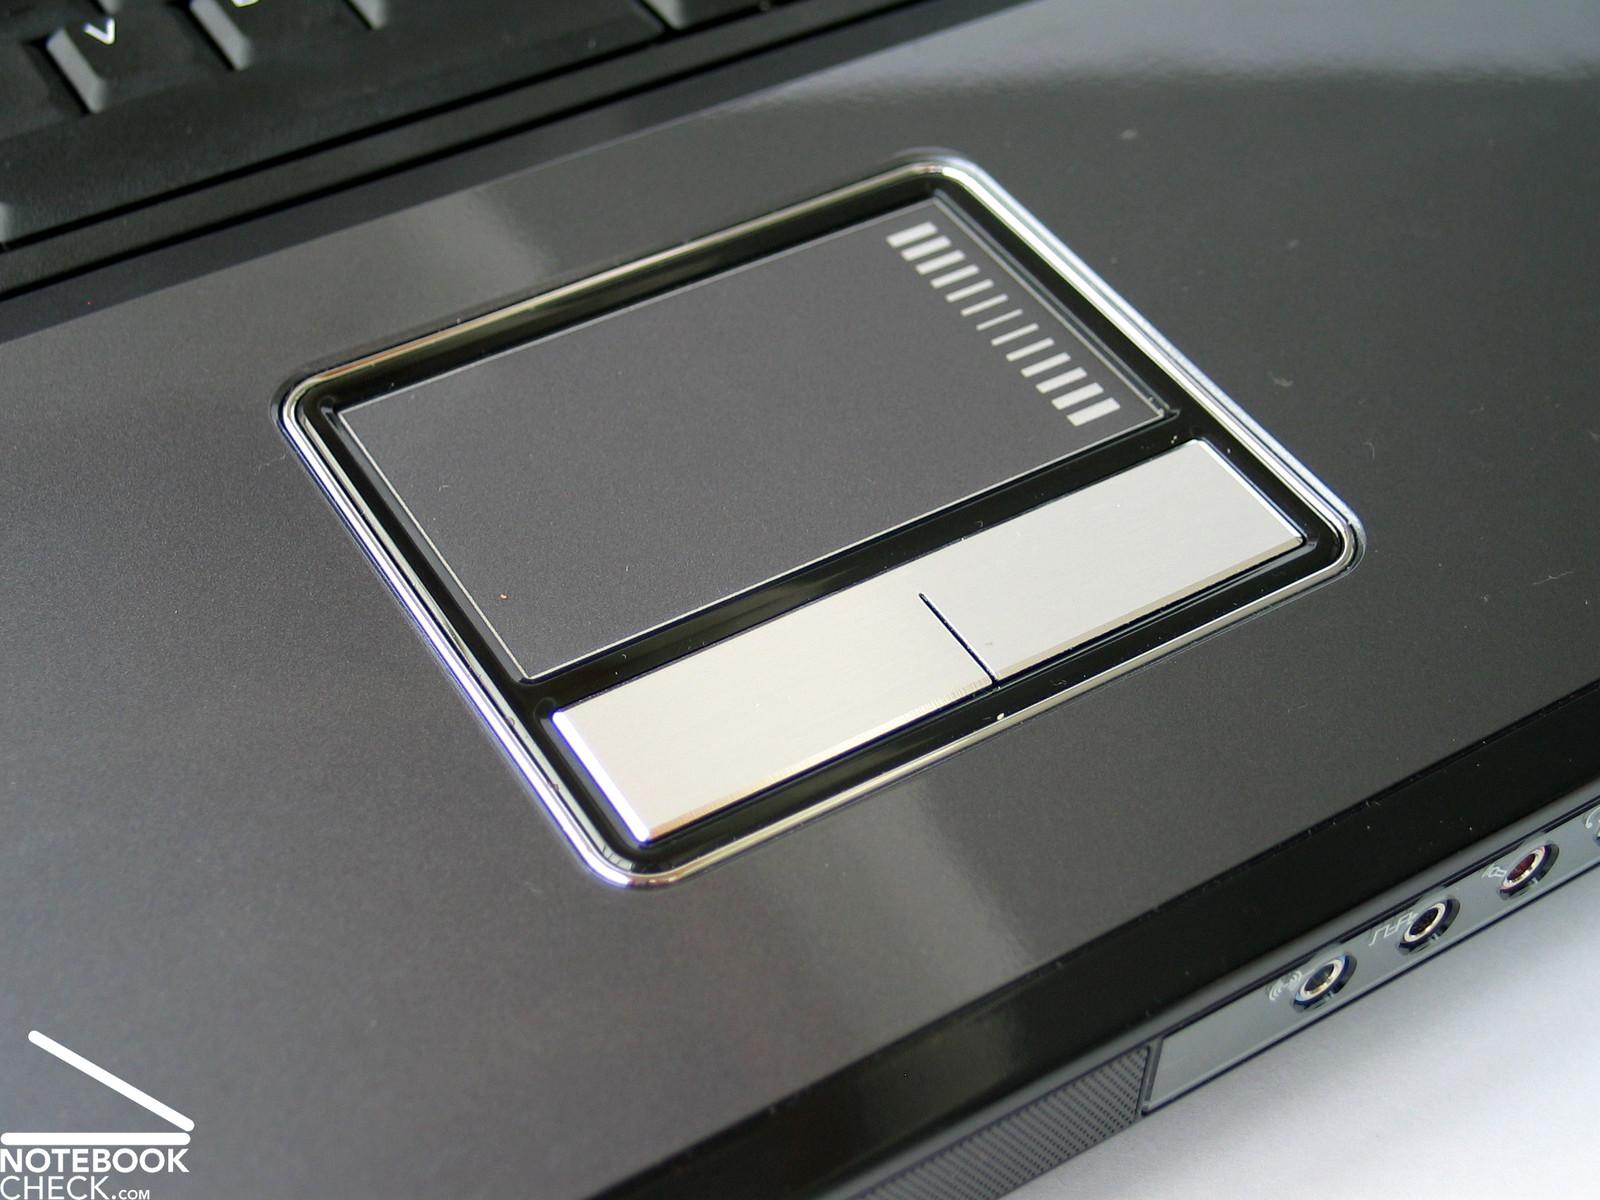 CLEVO D900CD901C BLUETOOTH TREIBER WINDOWS 7